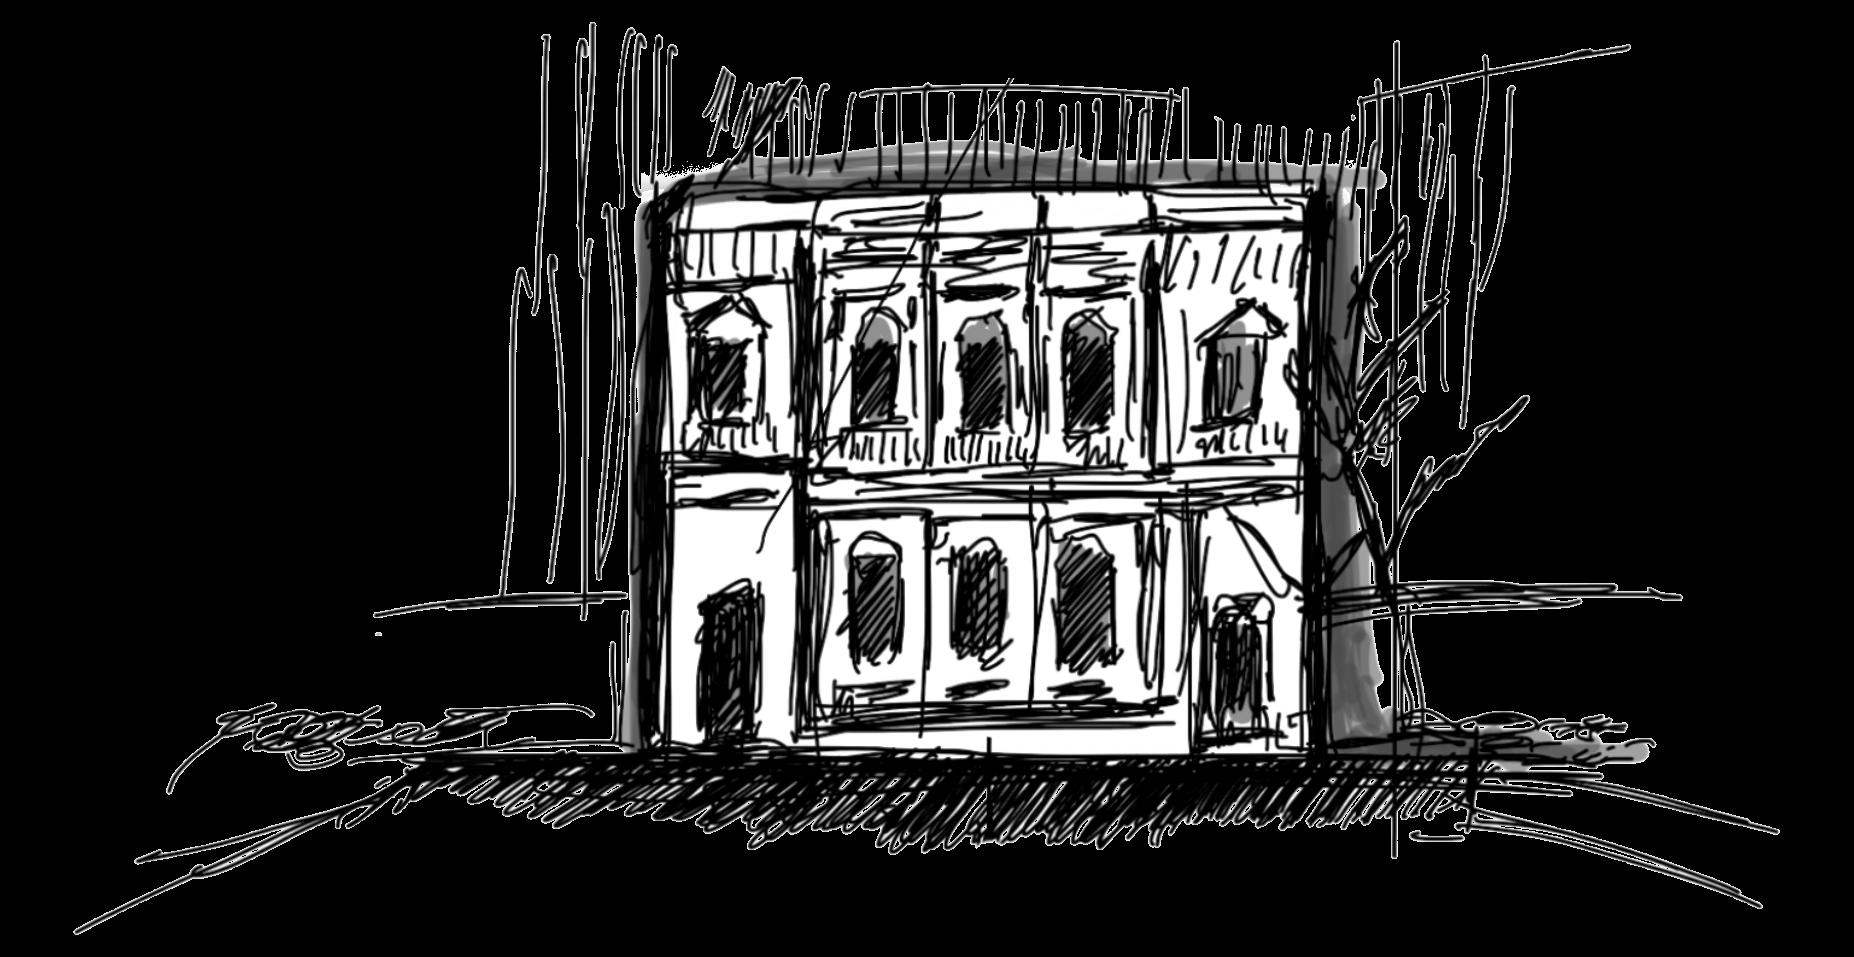 Sketch of the University of Melbourne School of Design